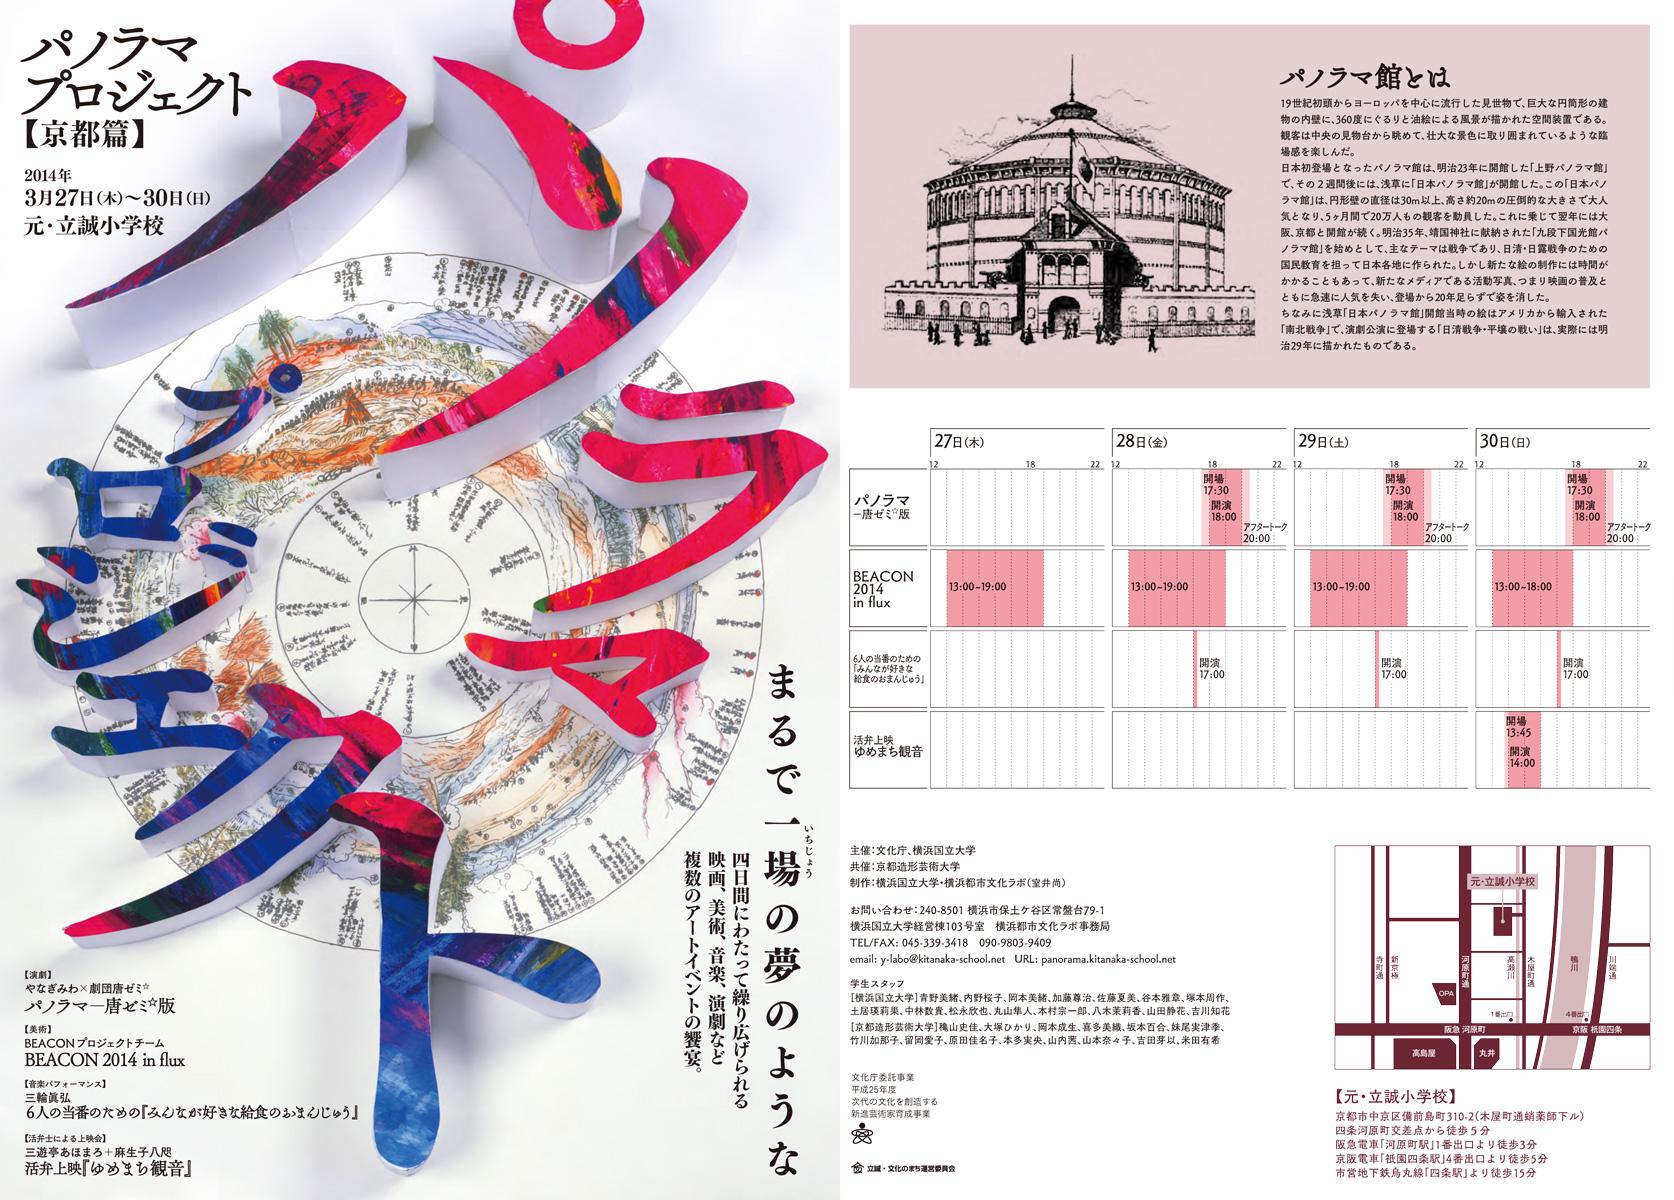 http://karazemi.com/perform/pano_kyoto_chirashi1.jpg